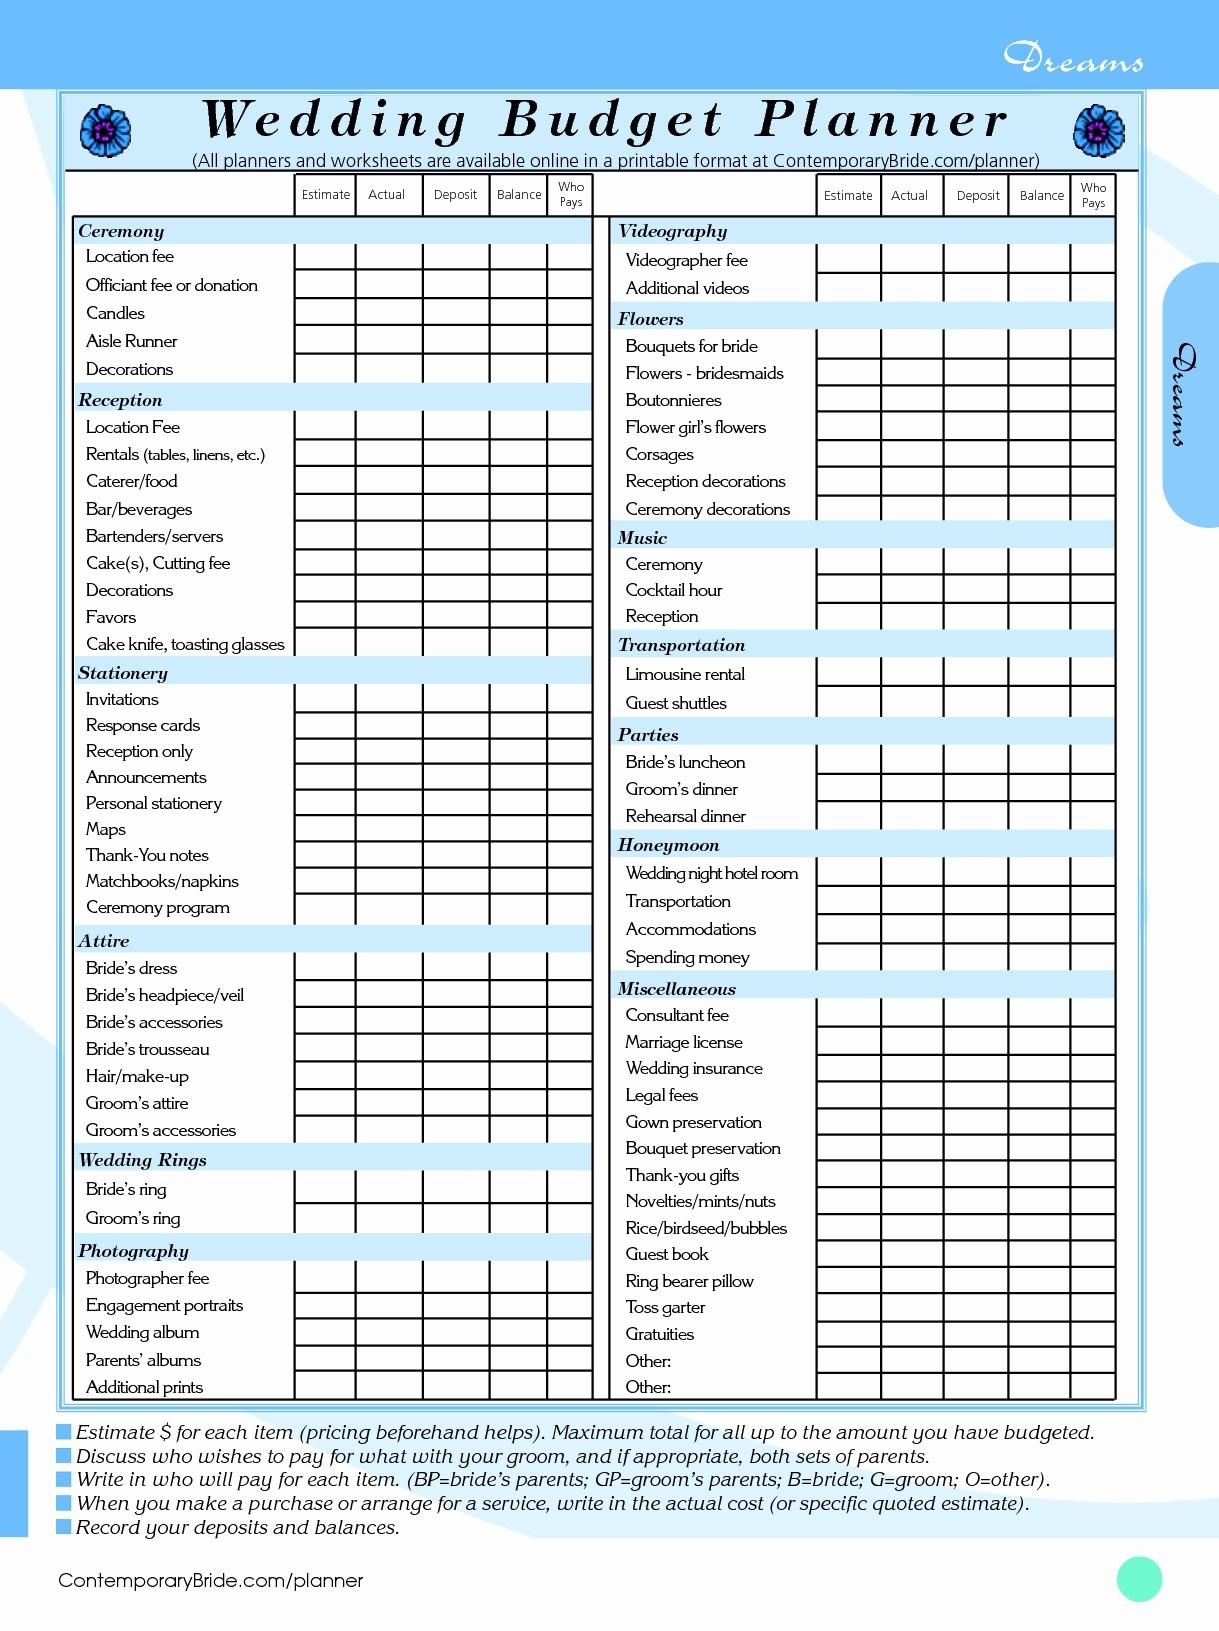 Wedding Budget Sheet Unique Wedding Bud Worksheet Printable | Wedding Budget Worksheet Printable